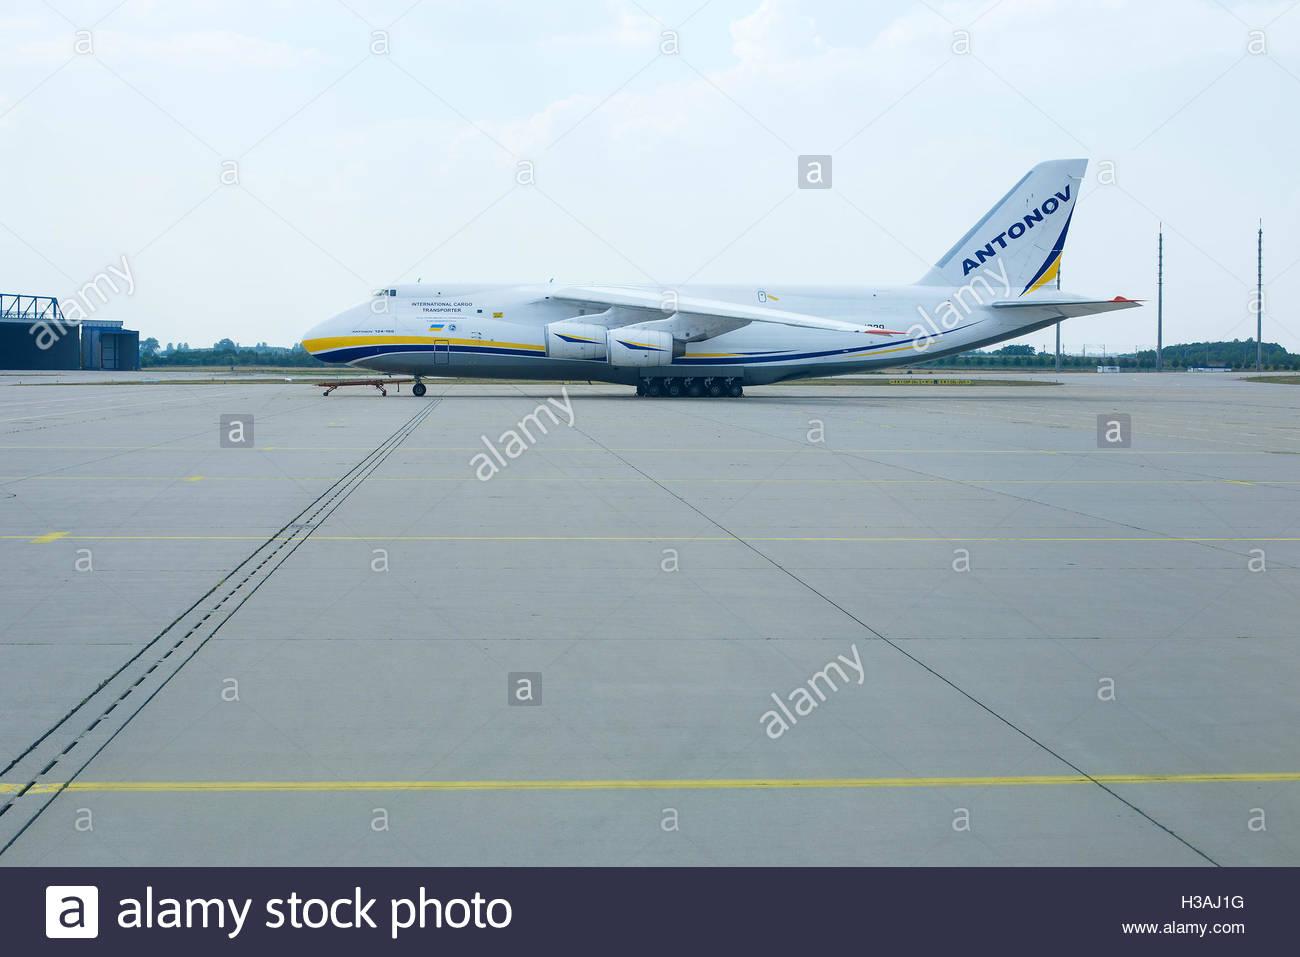 Antonov 124-100 at the Leipzig Airport. - Stock Image